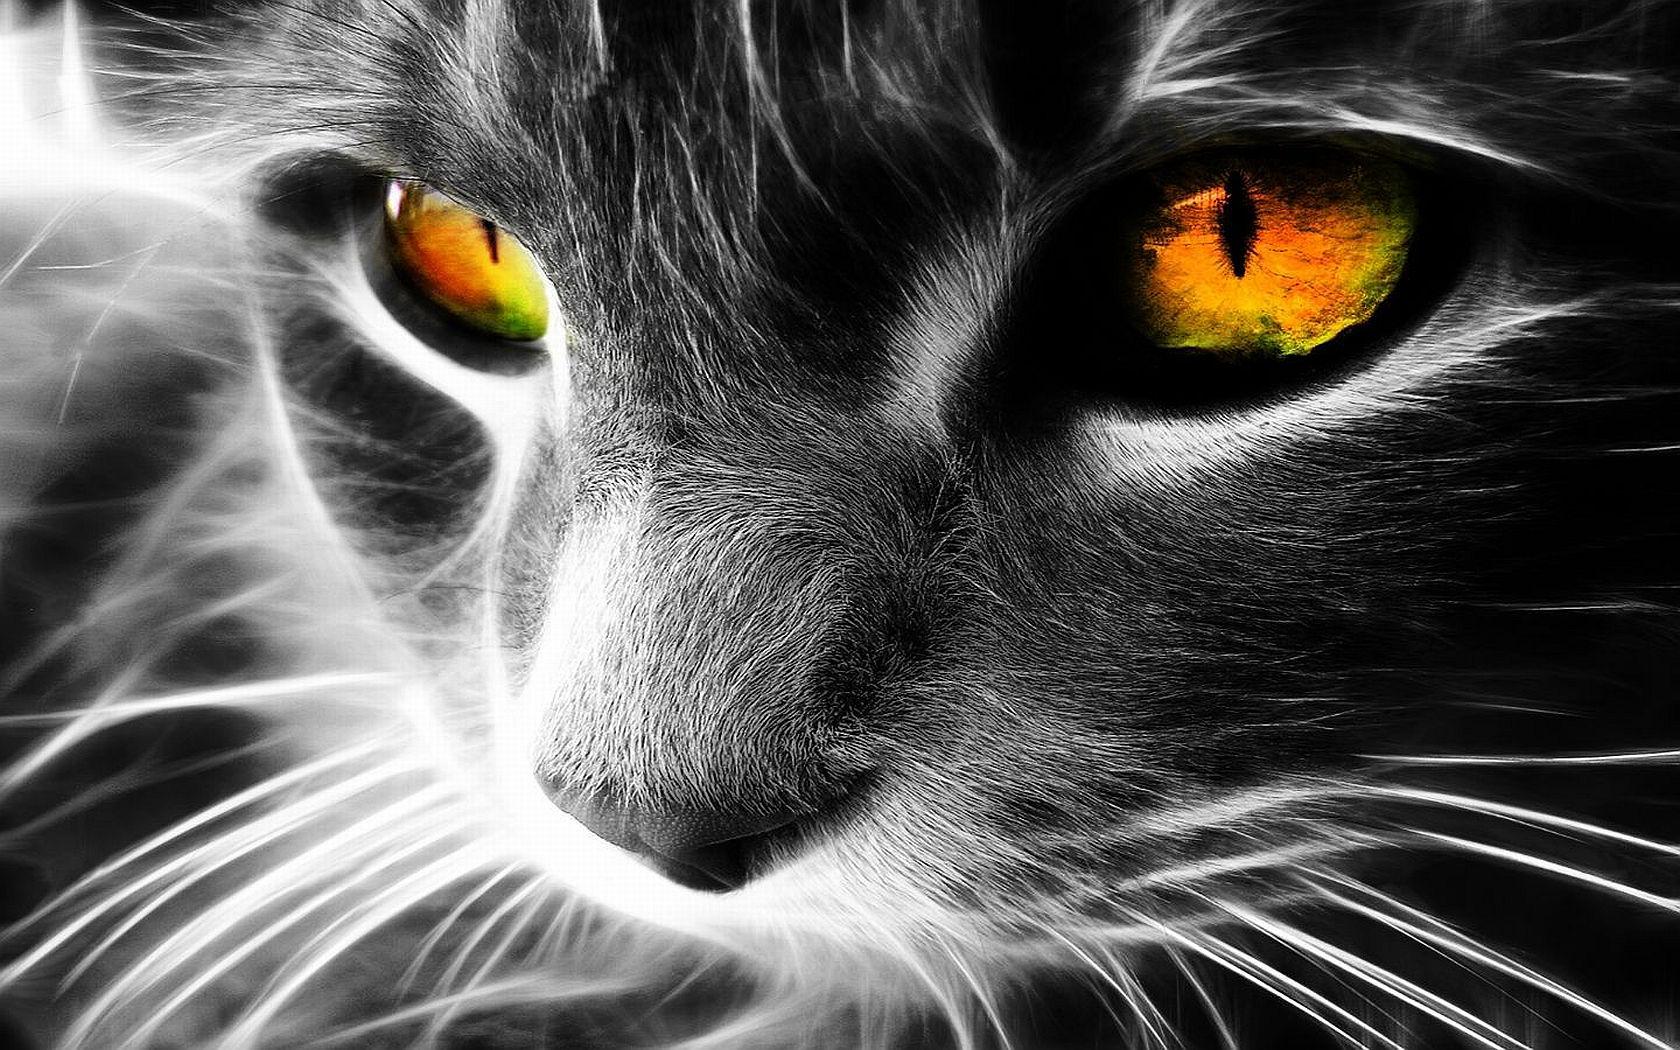 Animales - Gato  Fondo de Pantalla